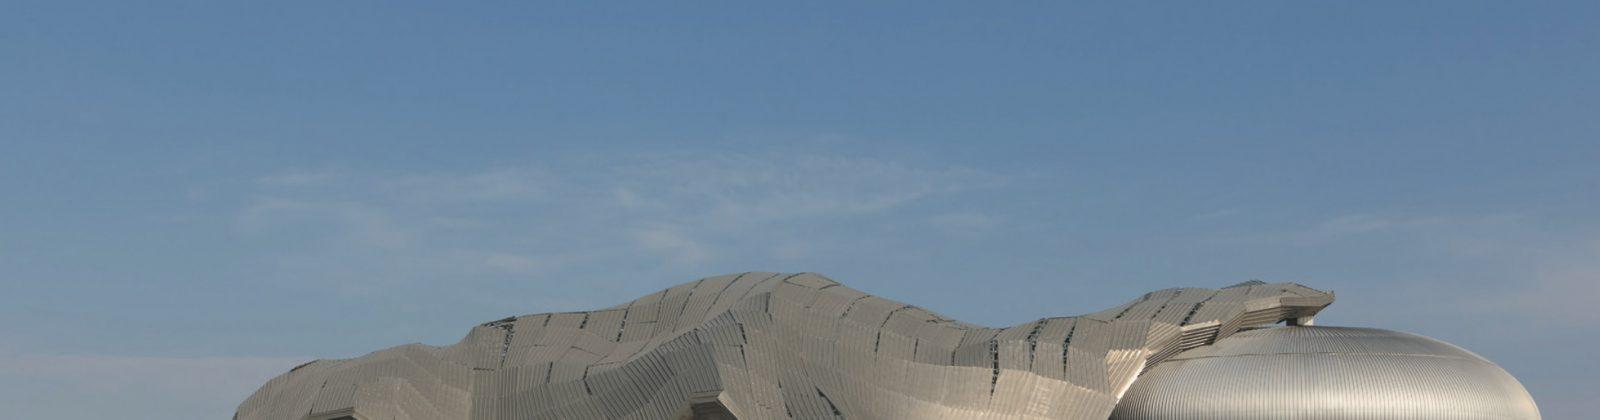 agora 2020 featured image